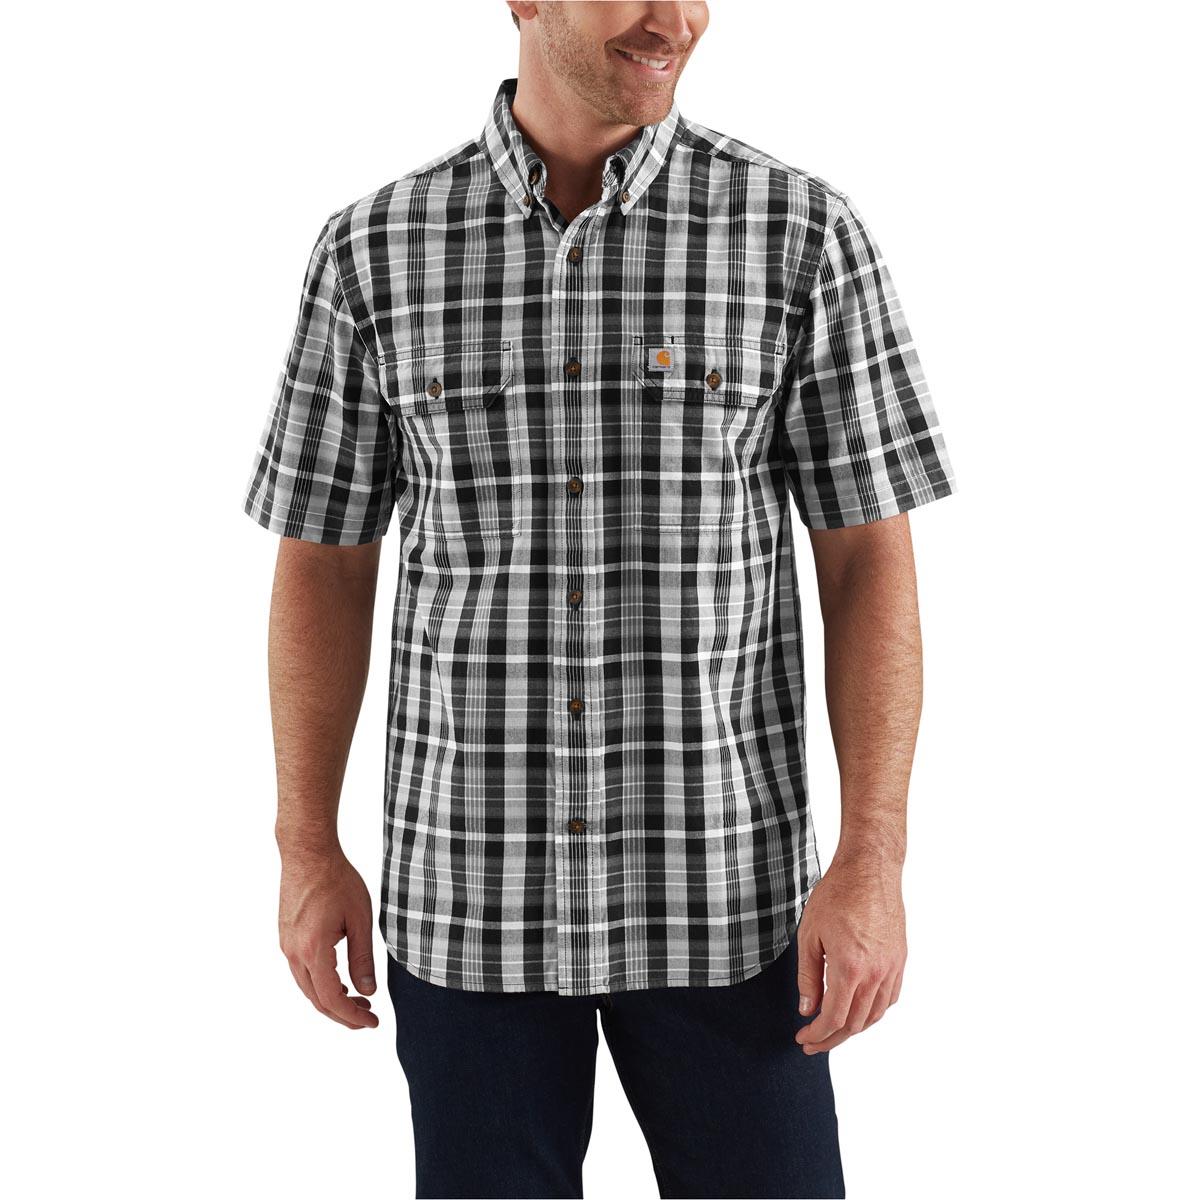 Carhartt Men's Fort Plaid Short Sleeve Shirt